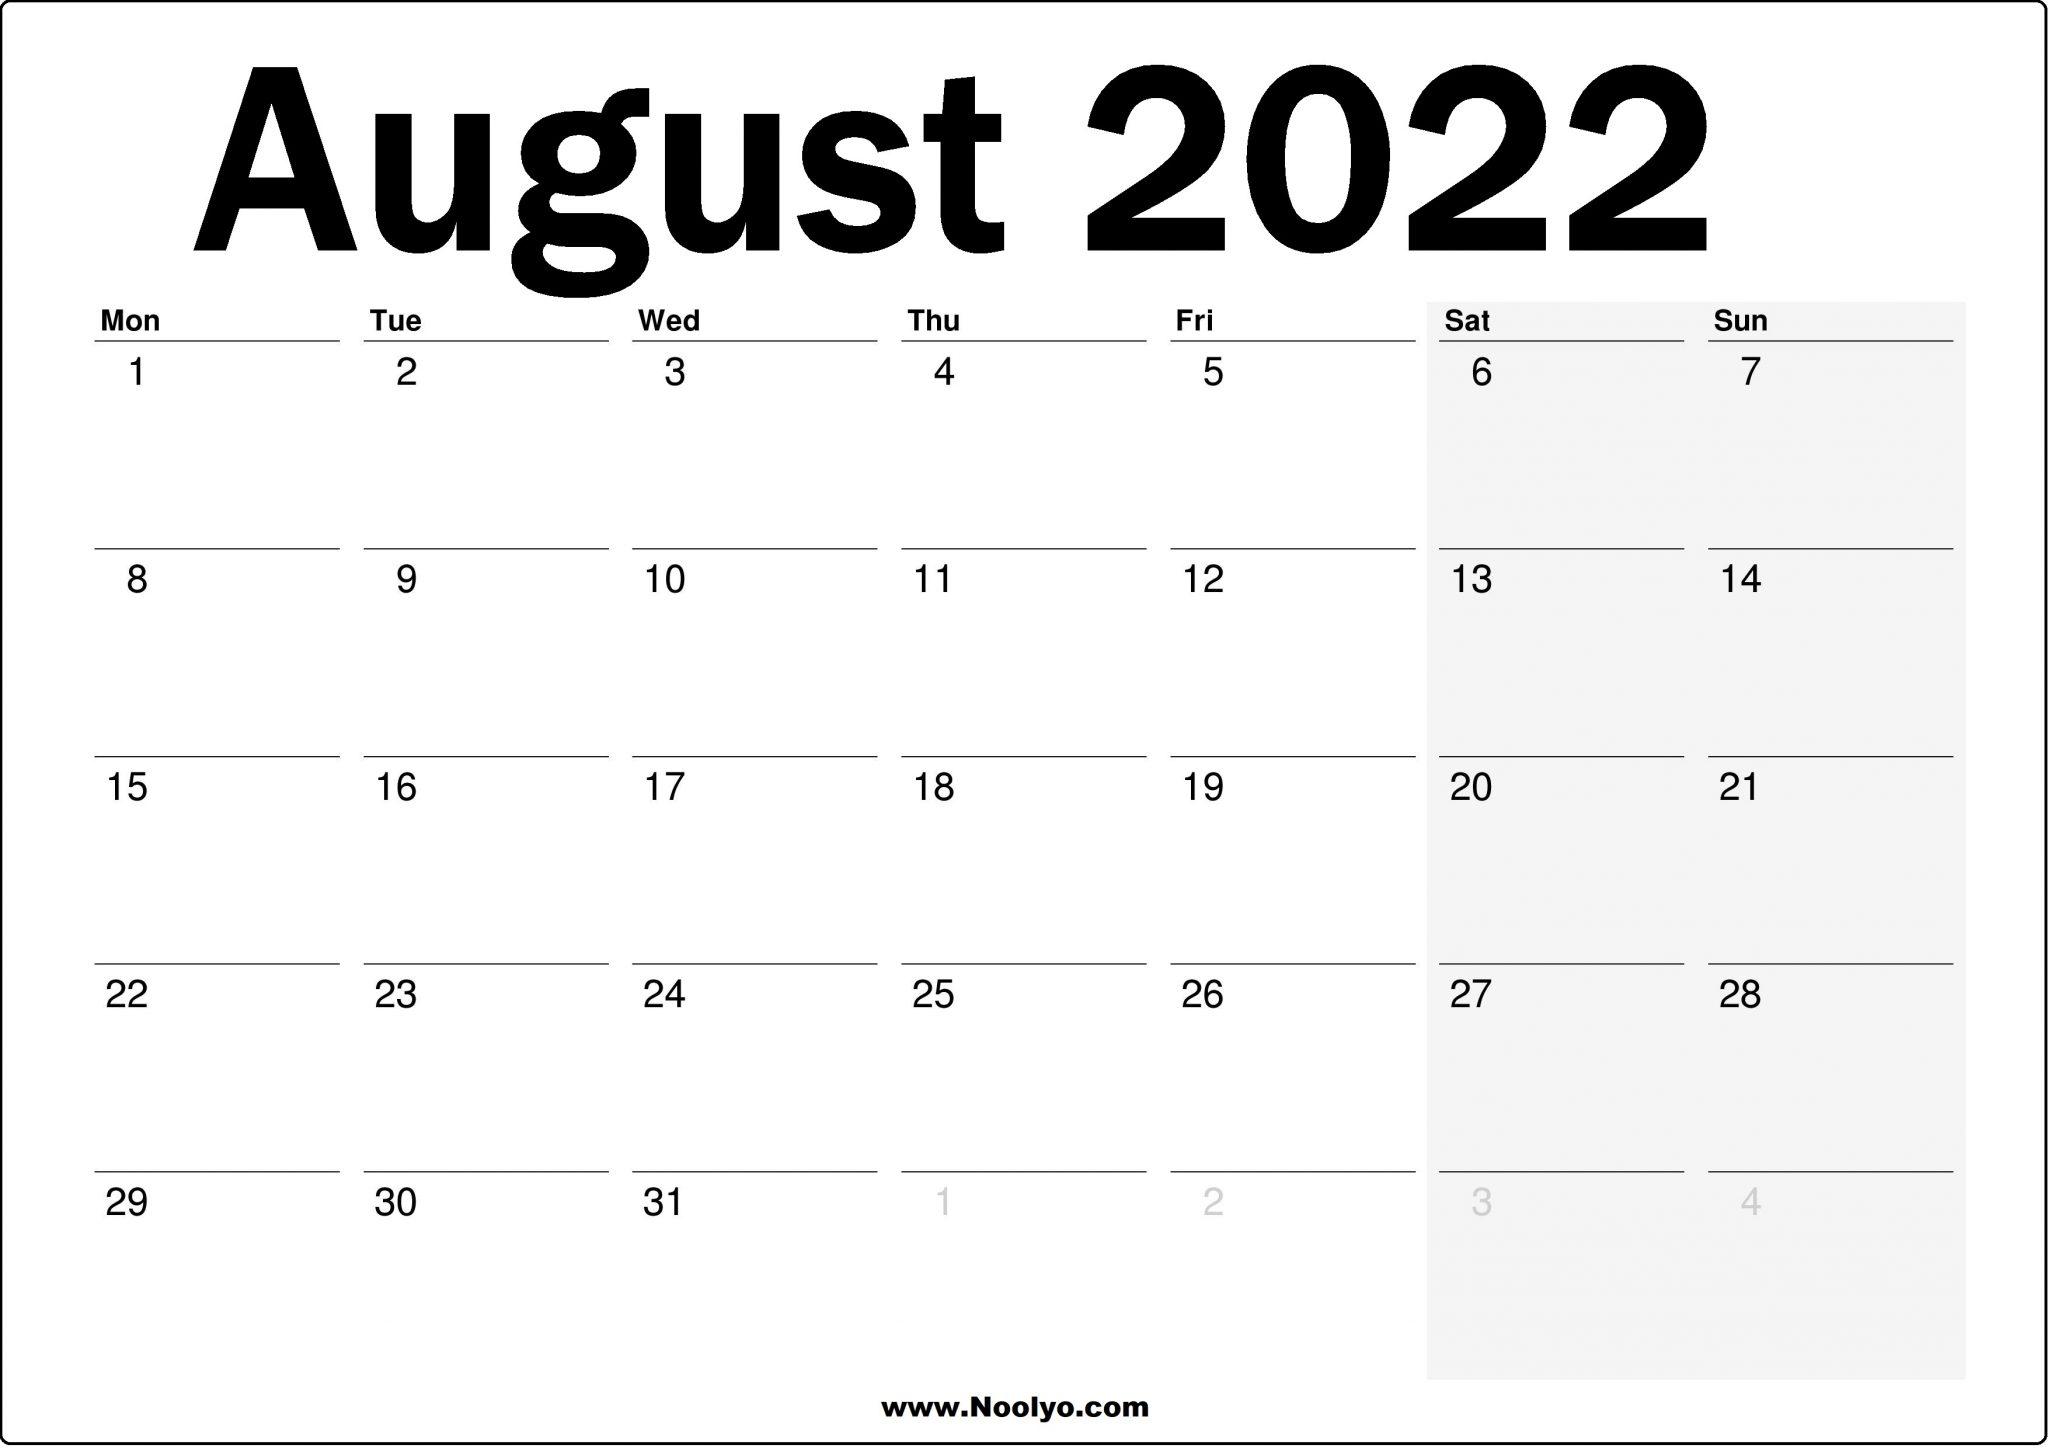 2022 UK August Calendar Printable - Noolyo.com